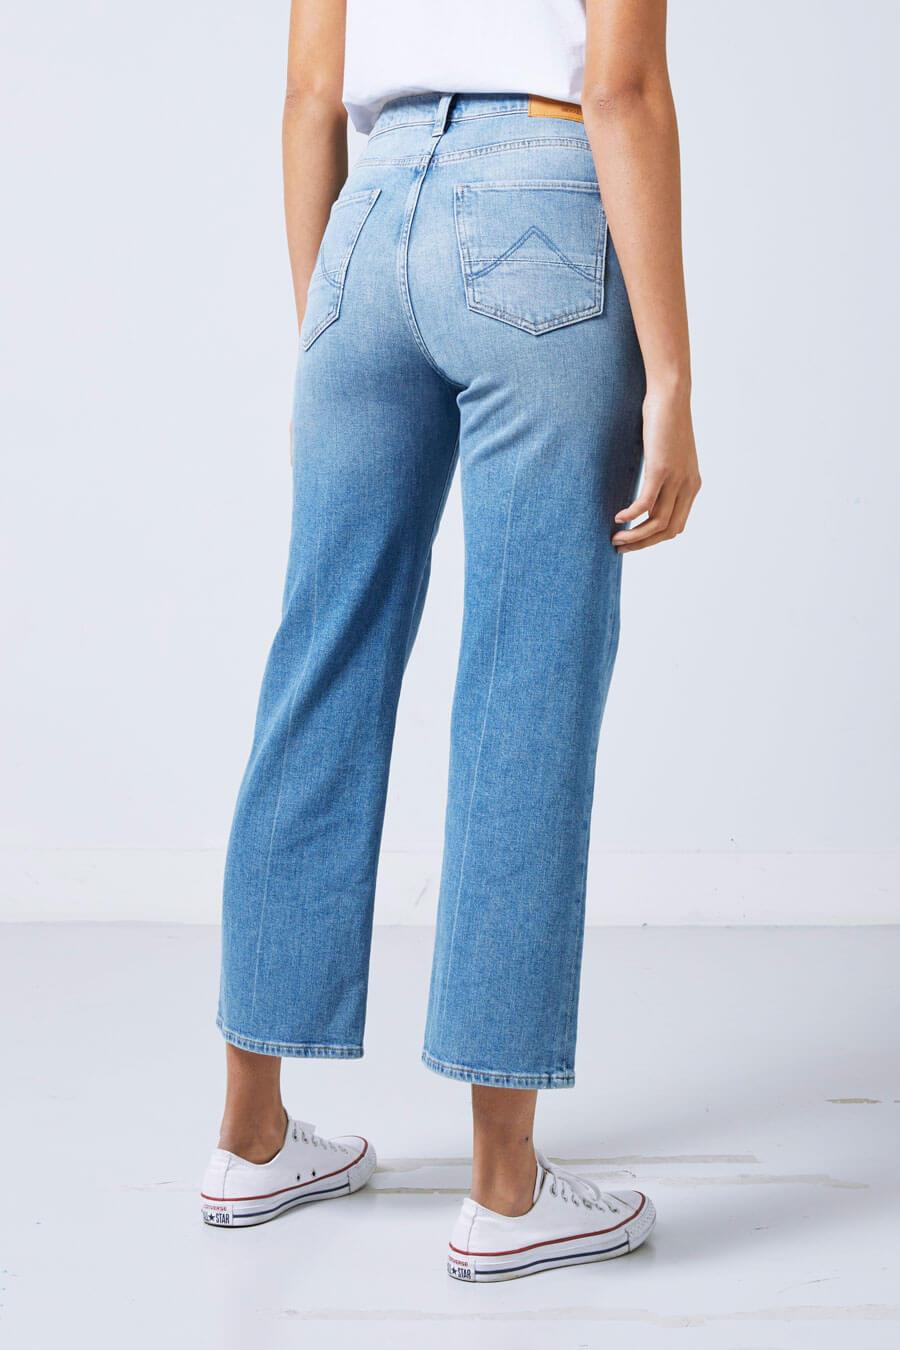 jackson Jeans alt